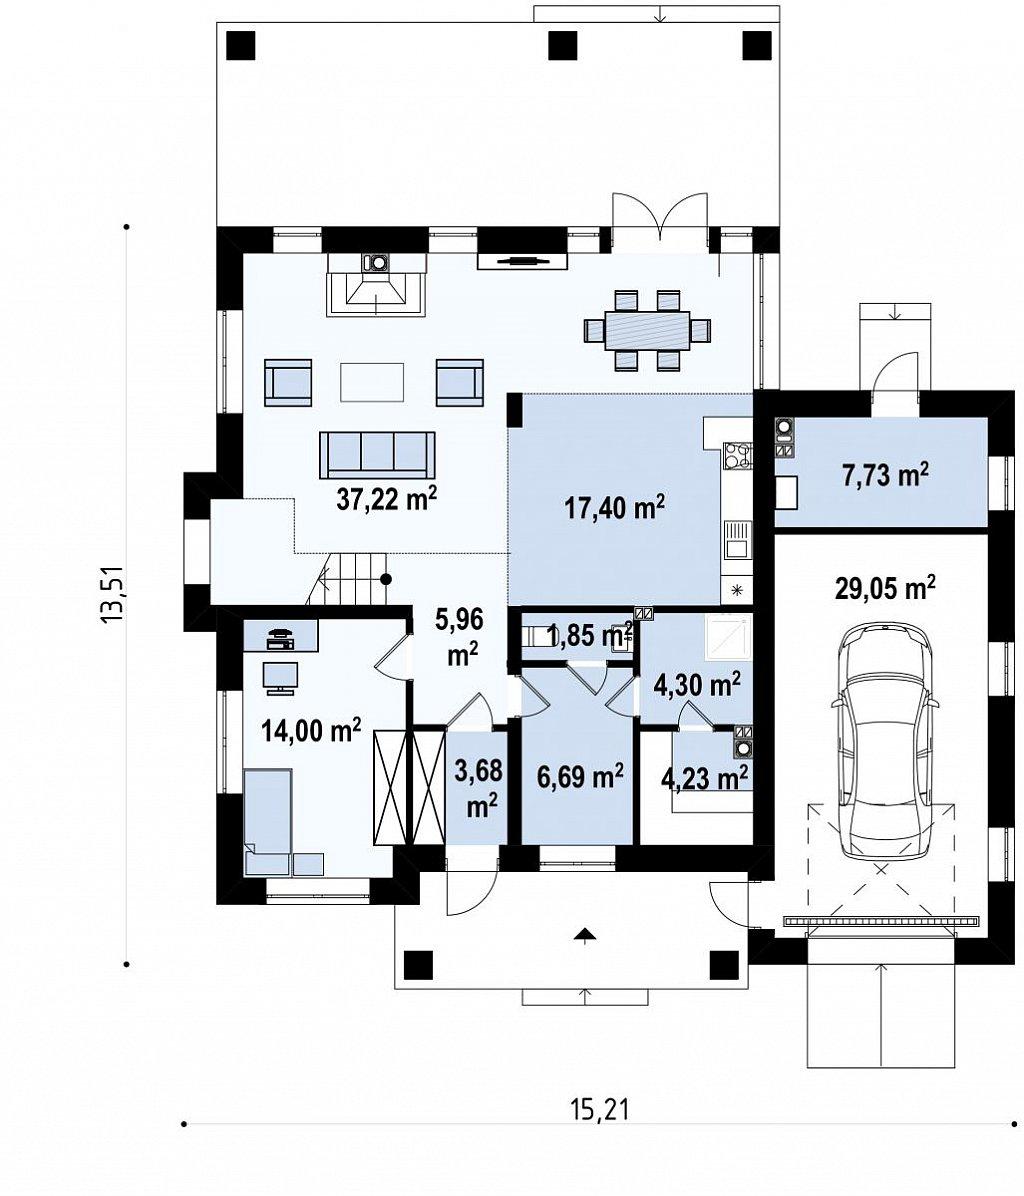 Первый этаж 133,8 м² дома Zz2 L +